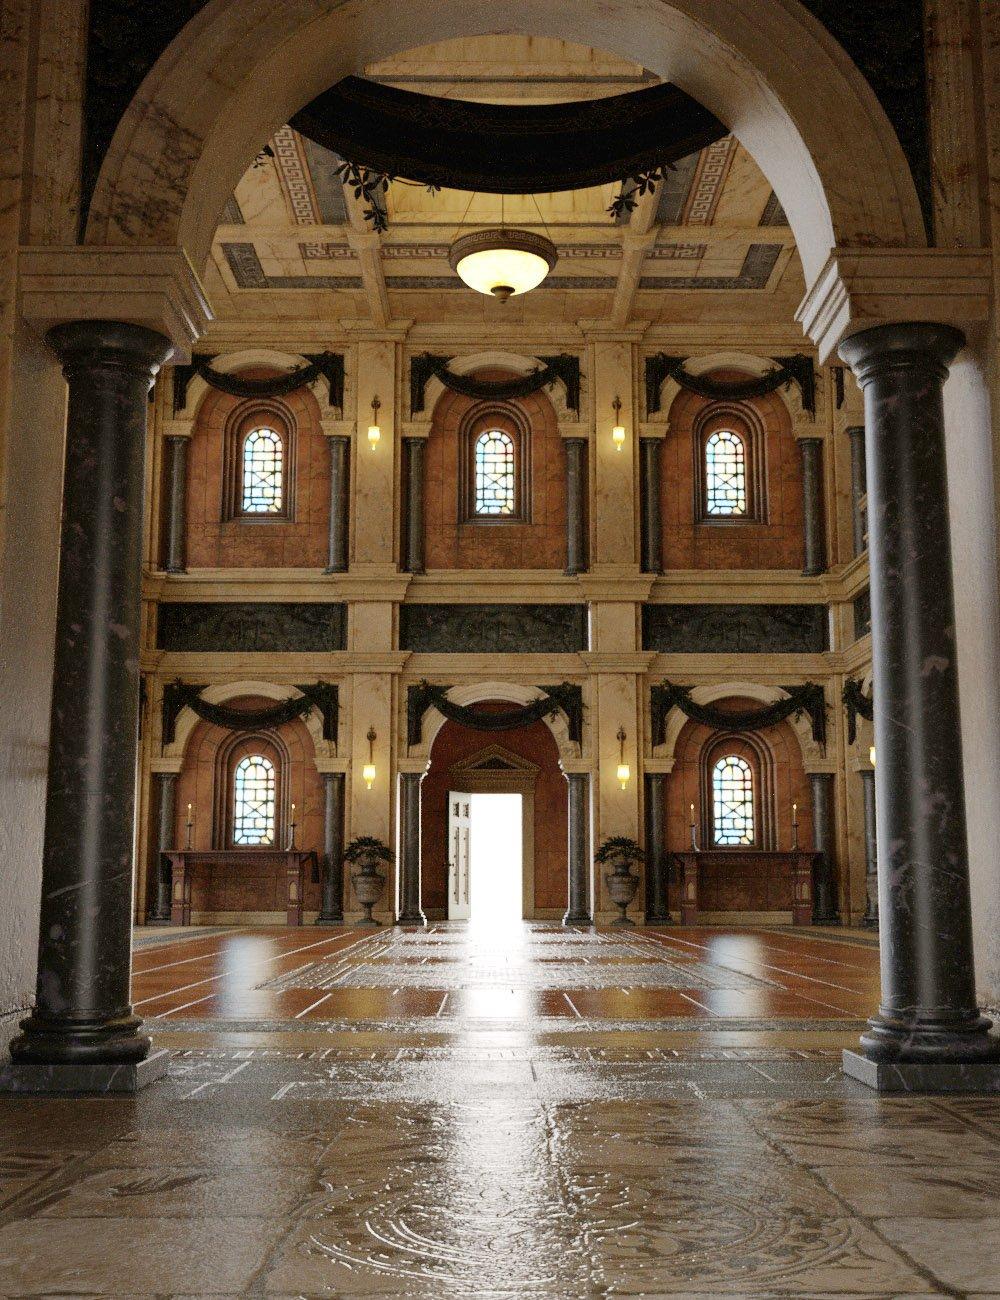 Borgia's Opulent Hall by: The Management, 3D Models by Daz 3D